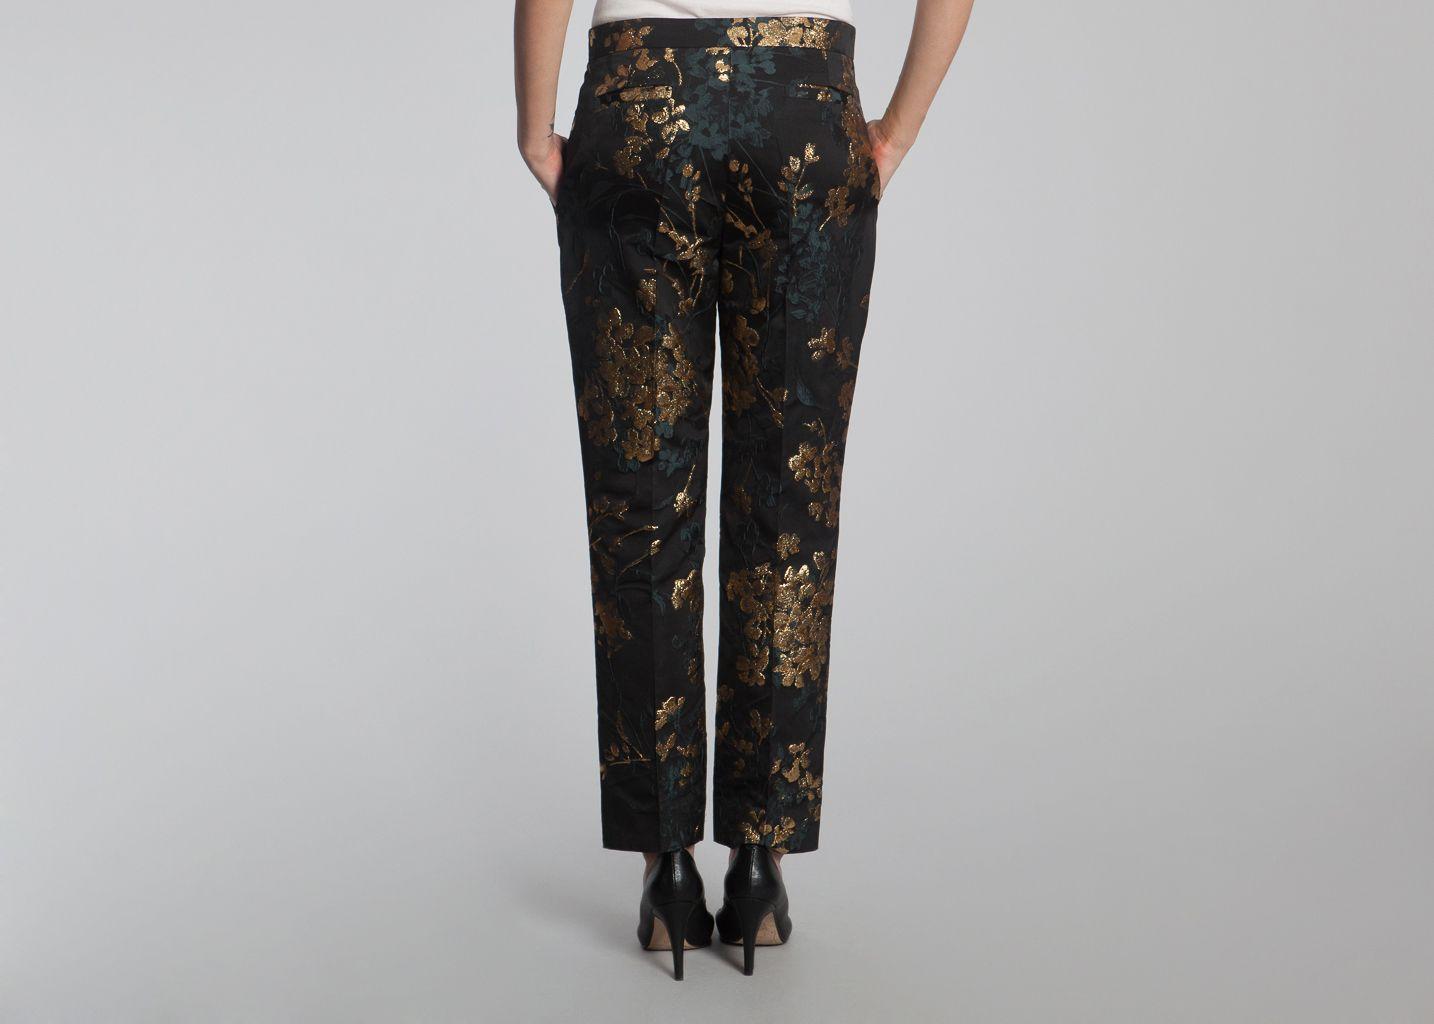 Pantalon Peter - Innamorato